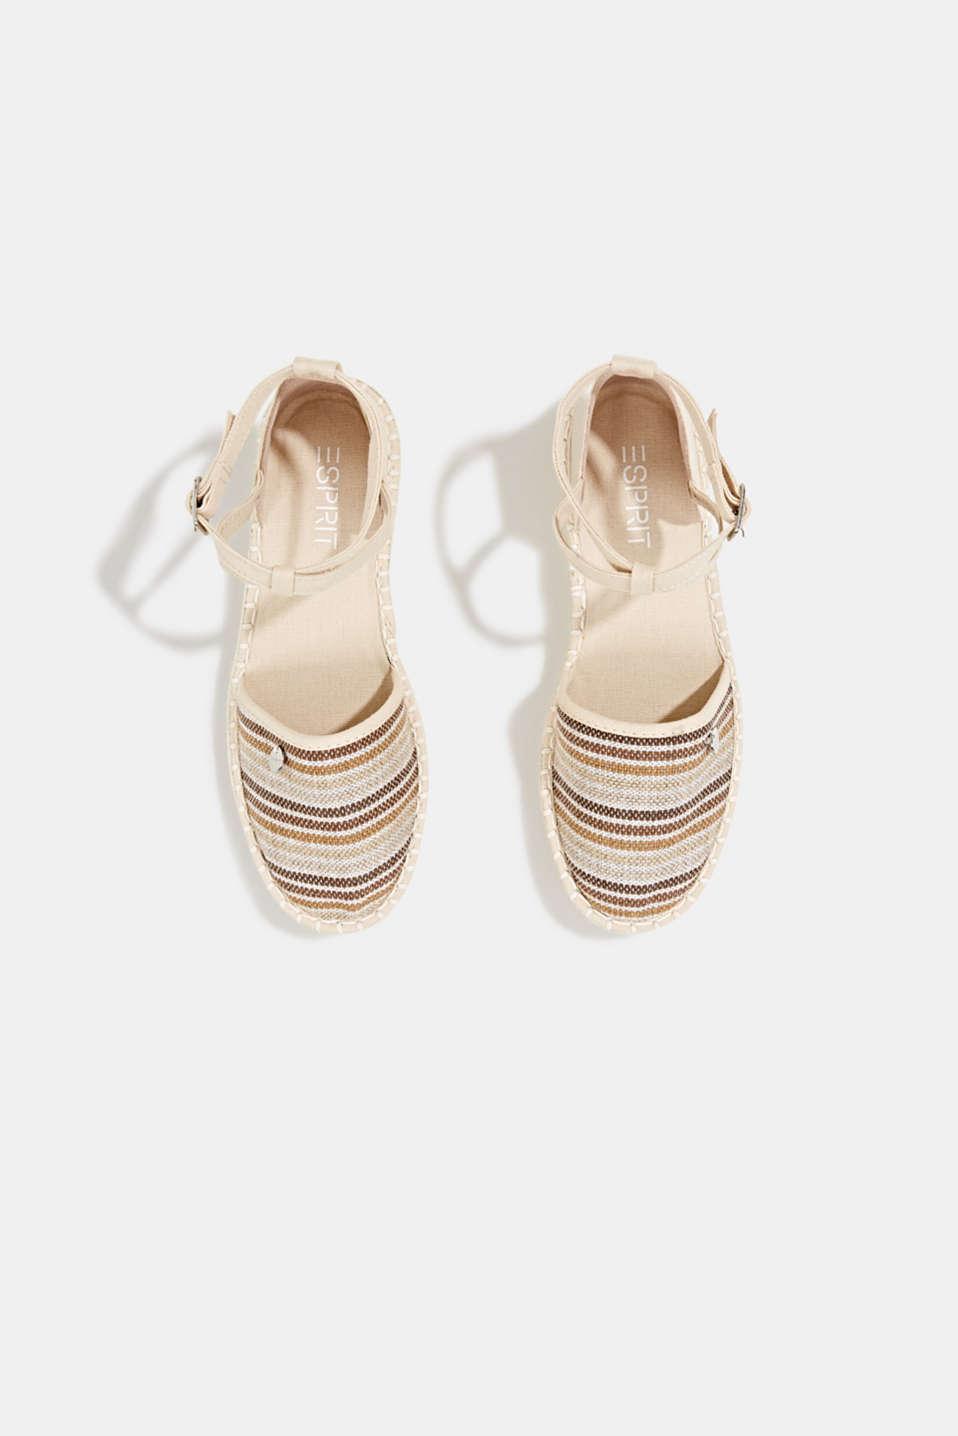 Espadrille sandals with stripes, CREAM BEIGE, detail image number 1